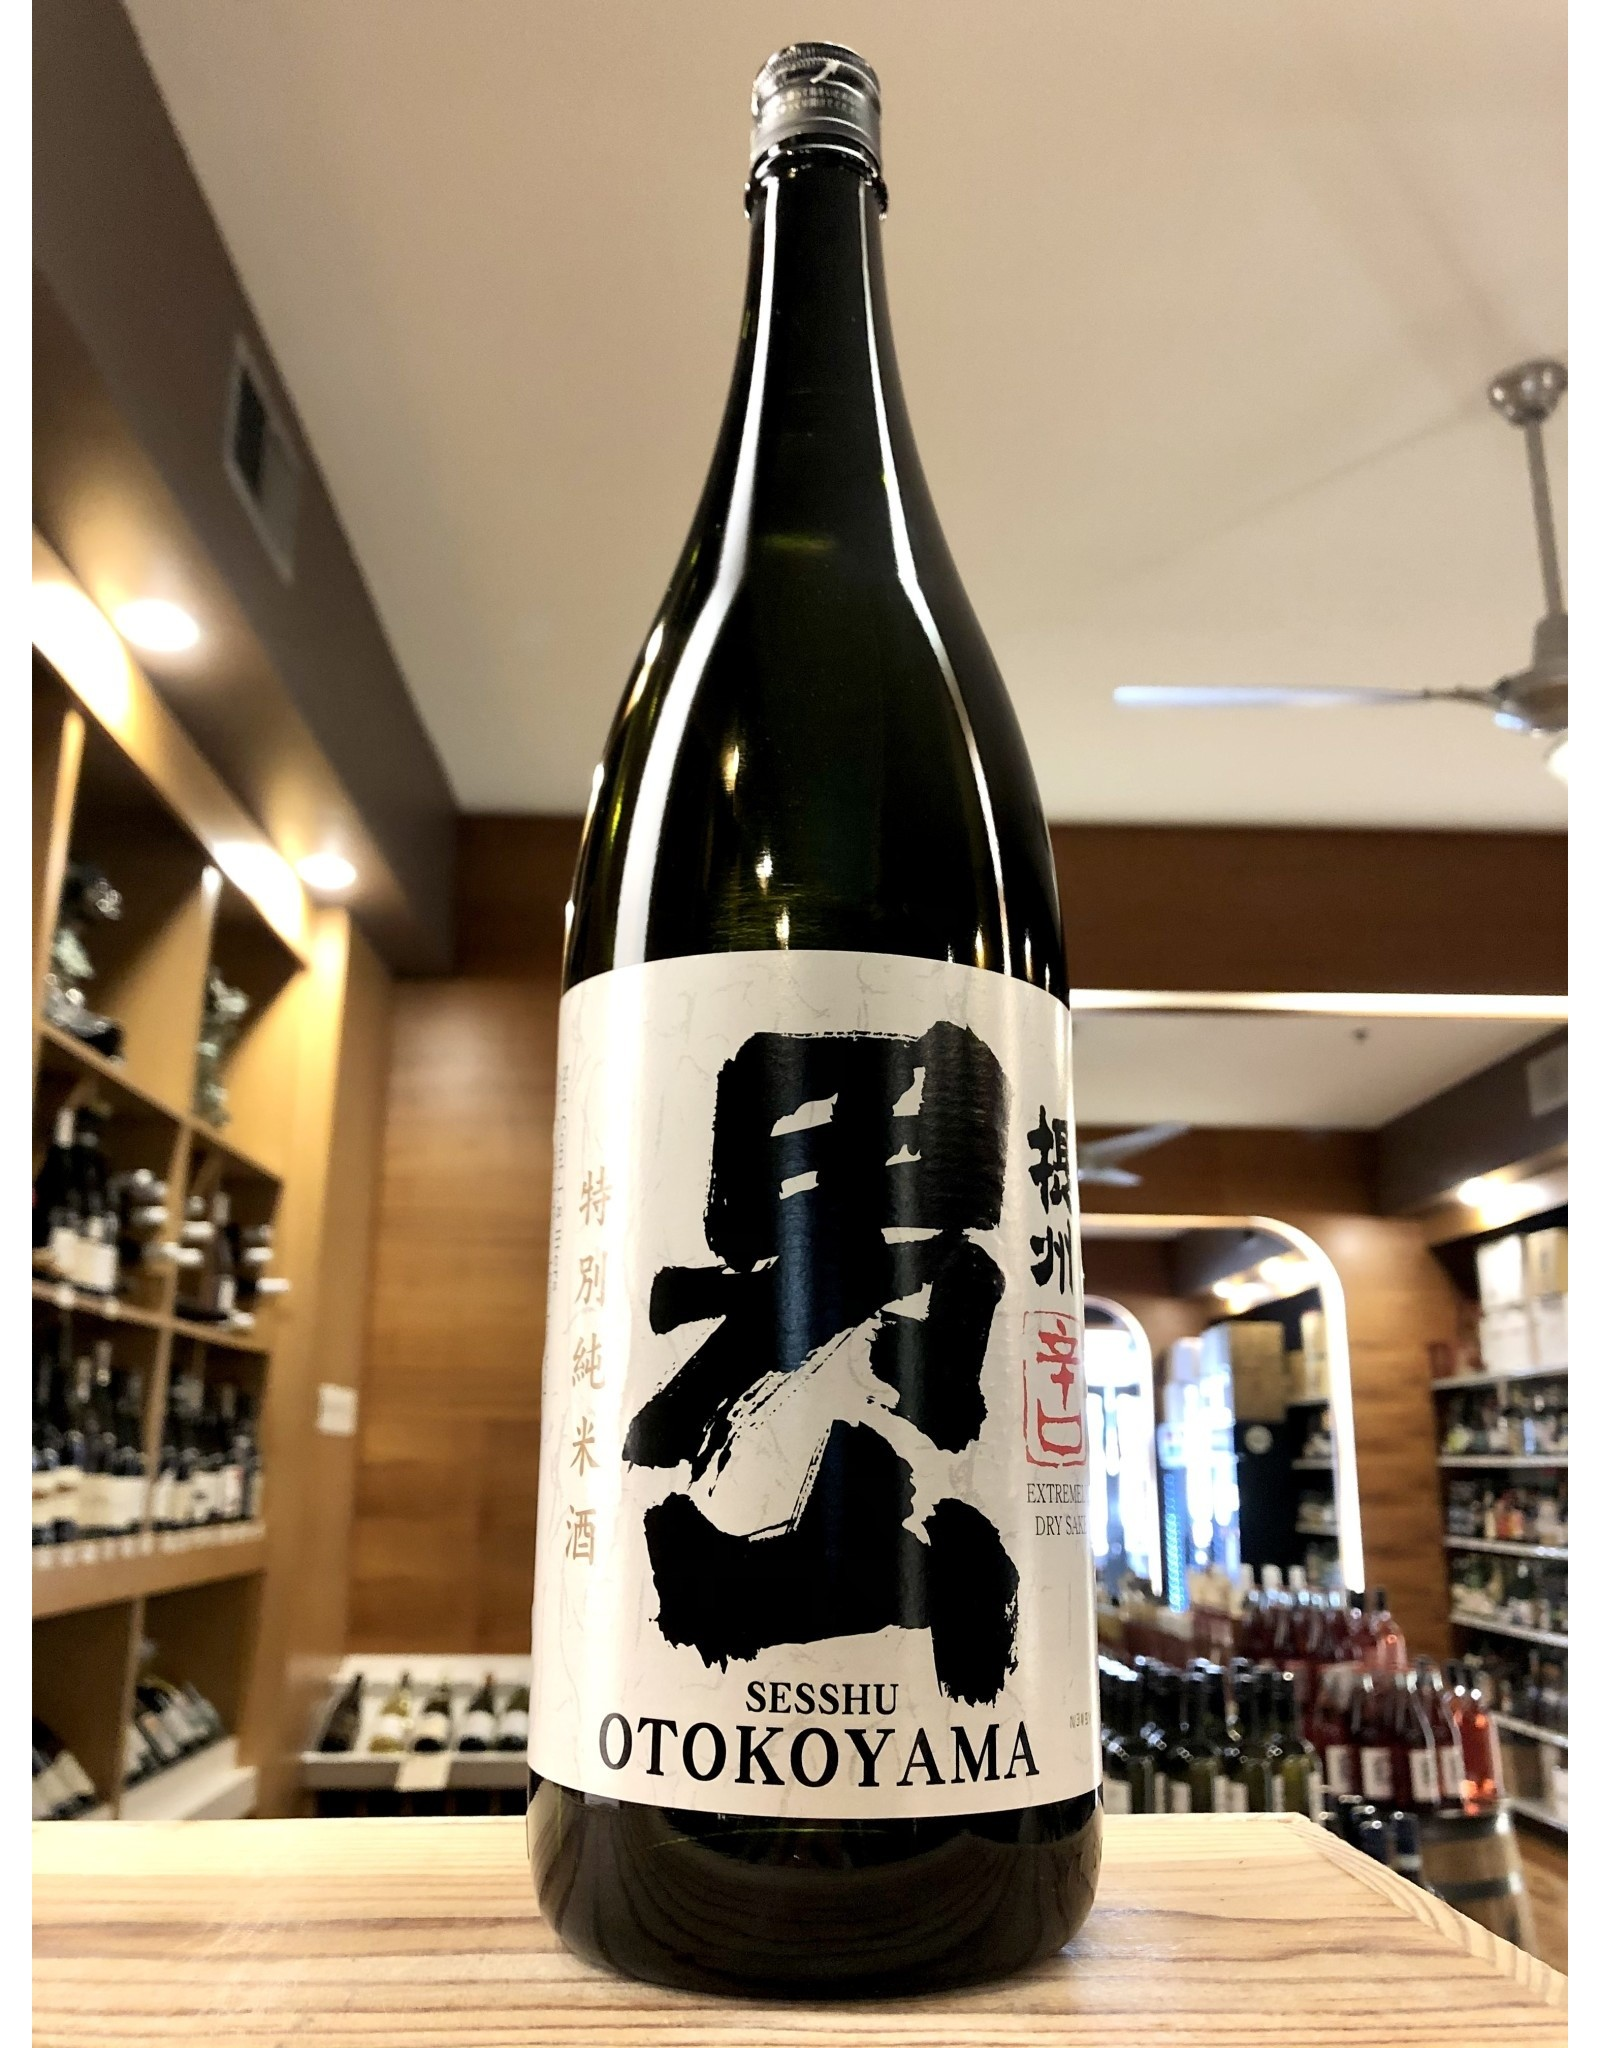 Sesshu Otokoyama Dry Sake - 1.8 Liter